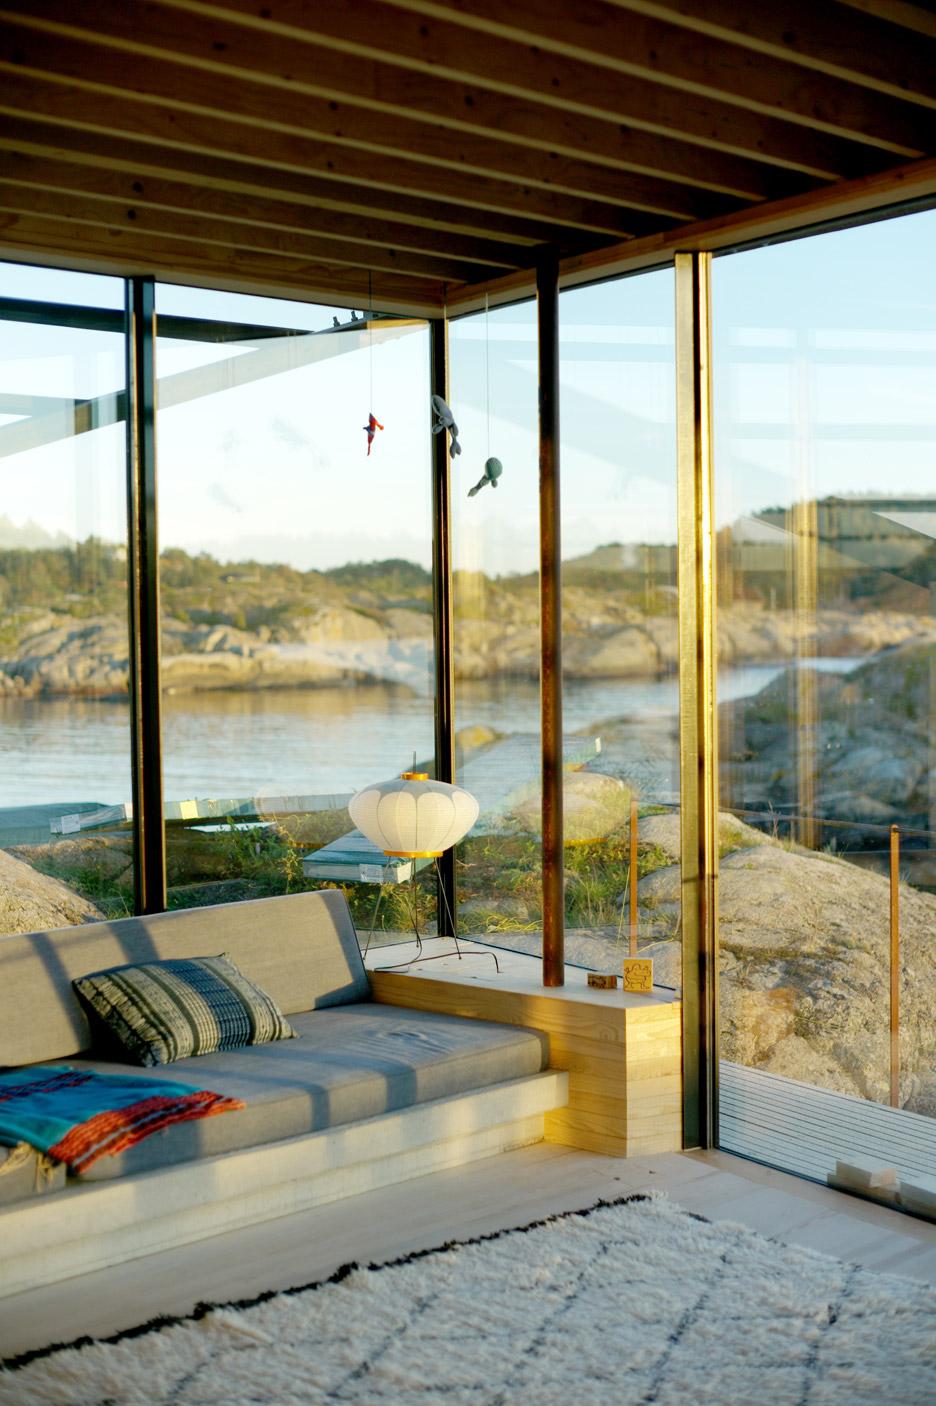 Cabin-Lille-Arøya-Lund-Hagem-Norway-Living-Room-Humble-Homes